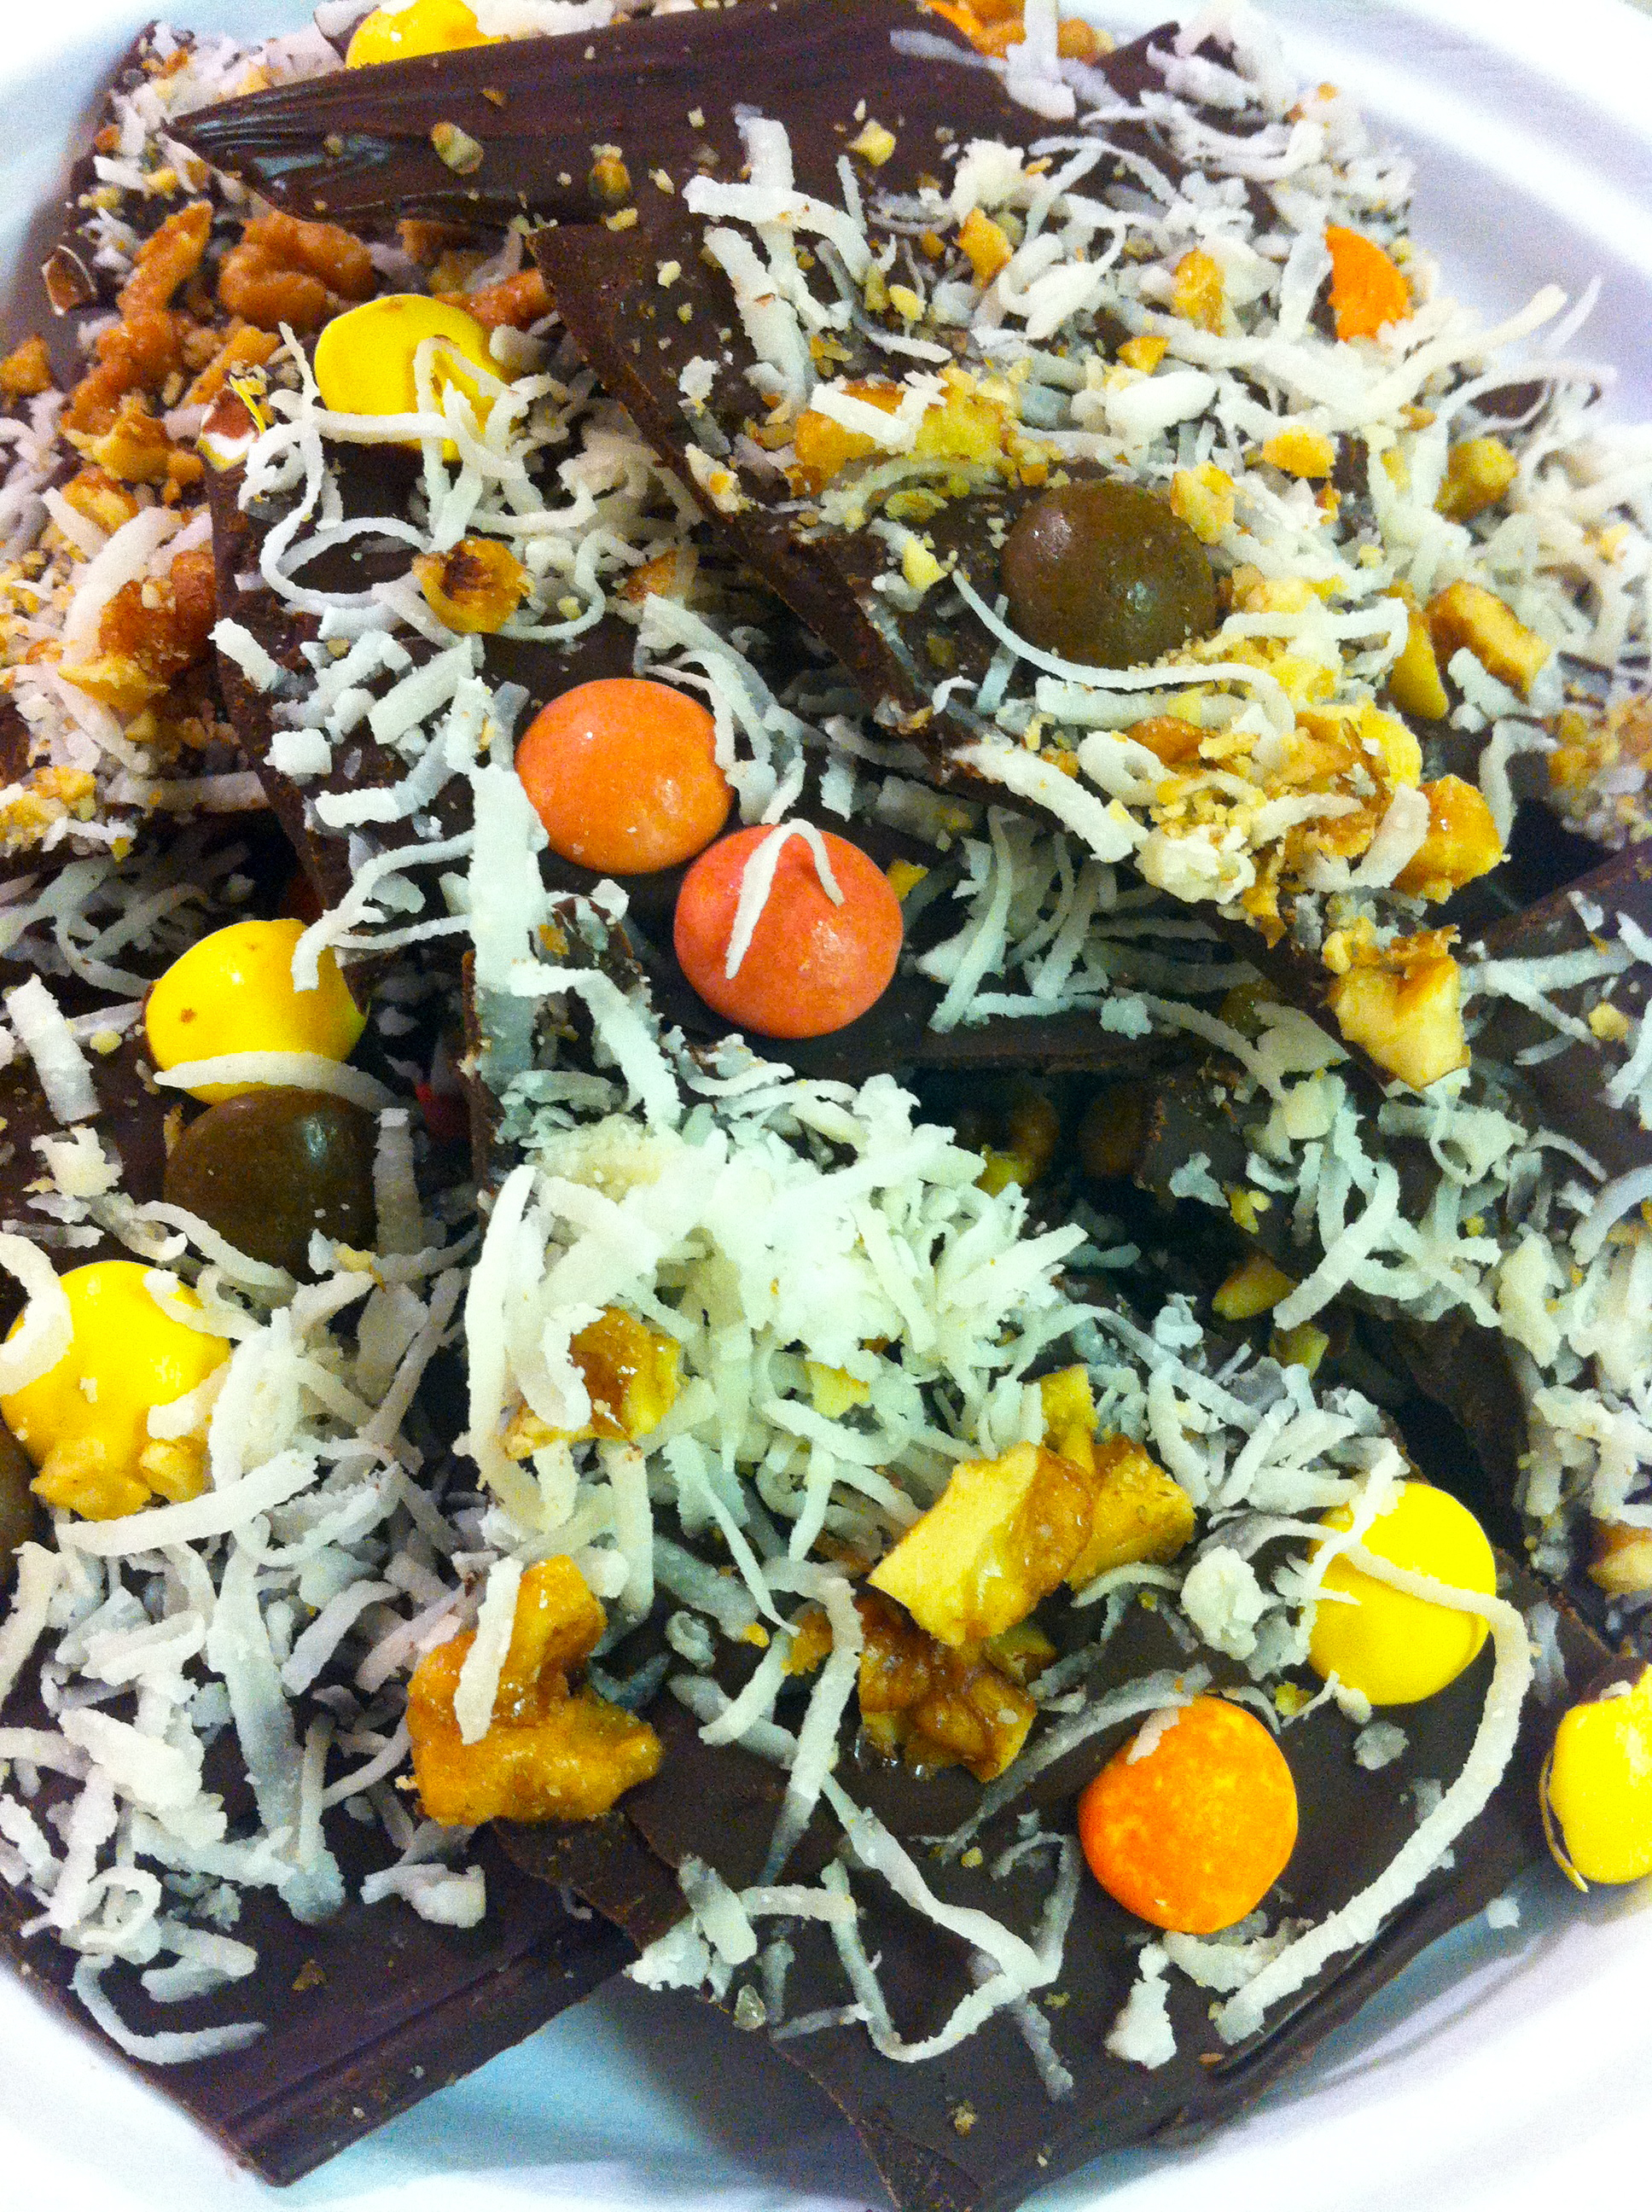 Chocolate Coconut Bark